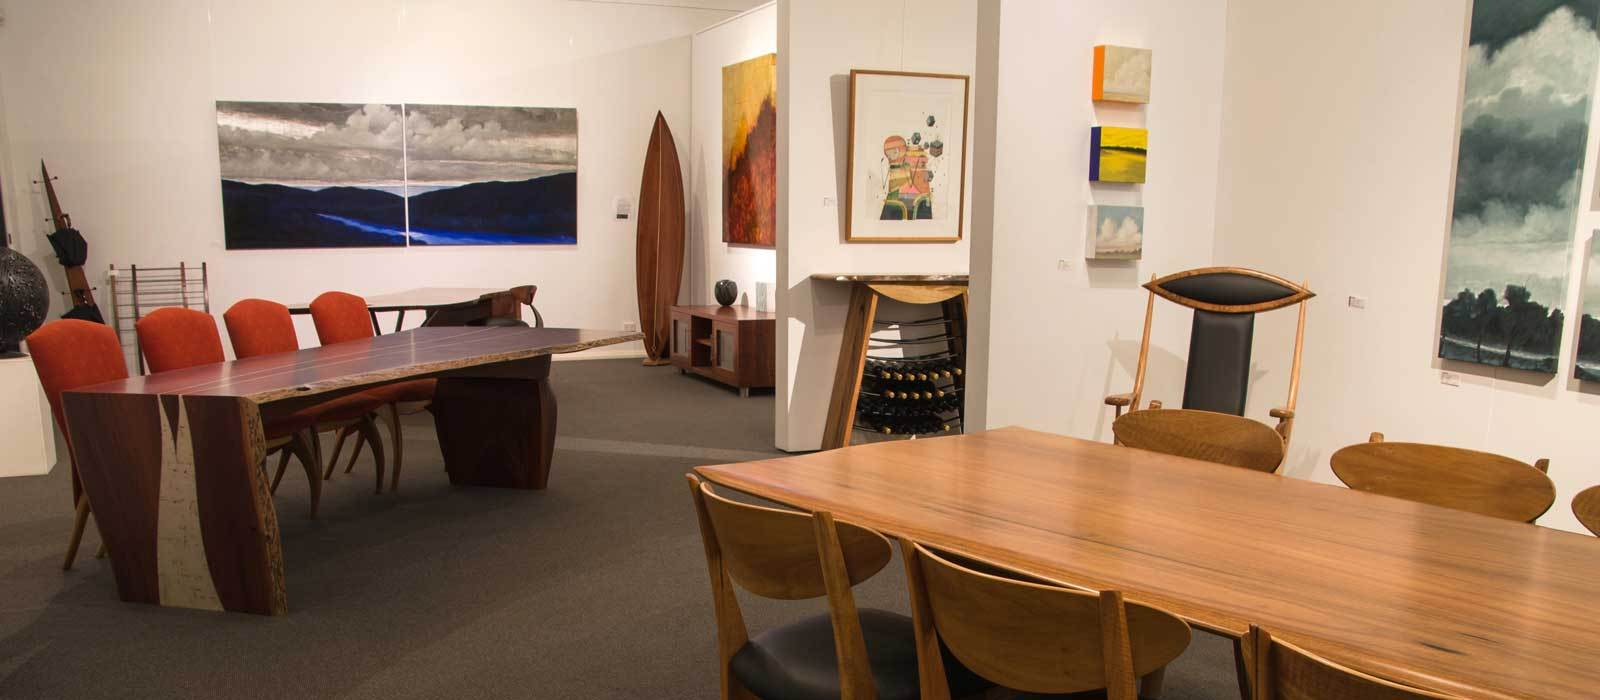 Inside-Gallery-2-2014-e1414293446551